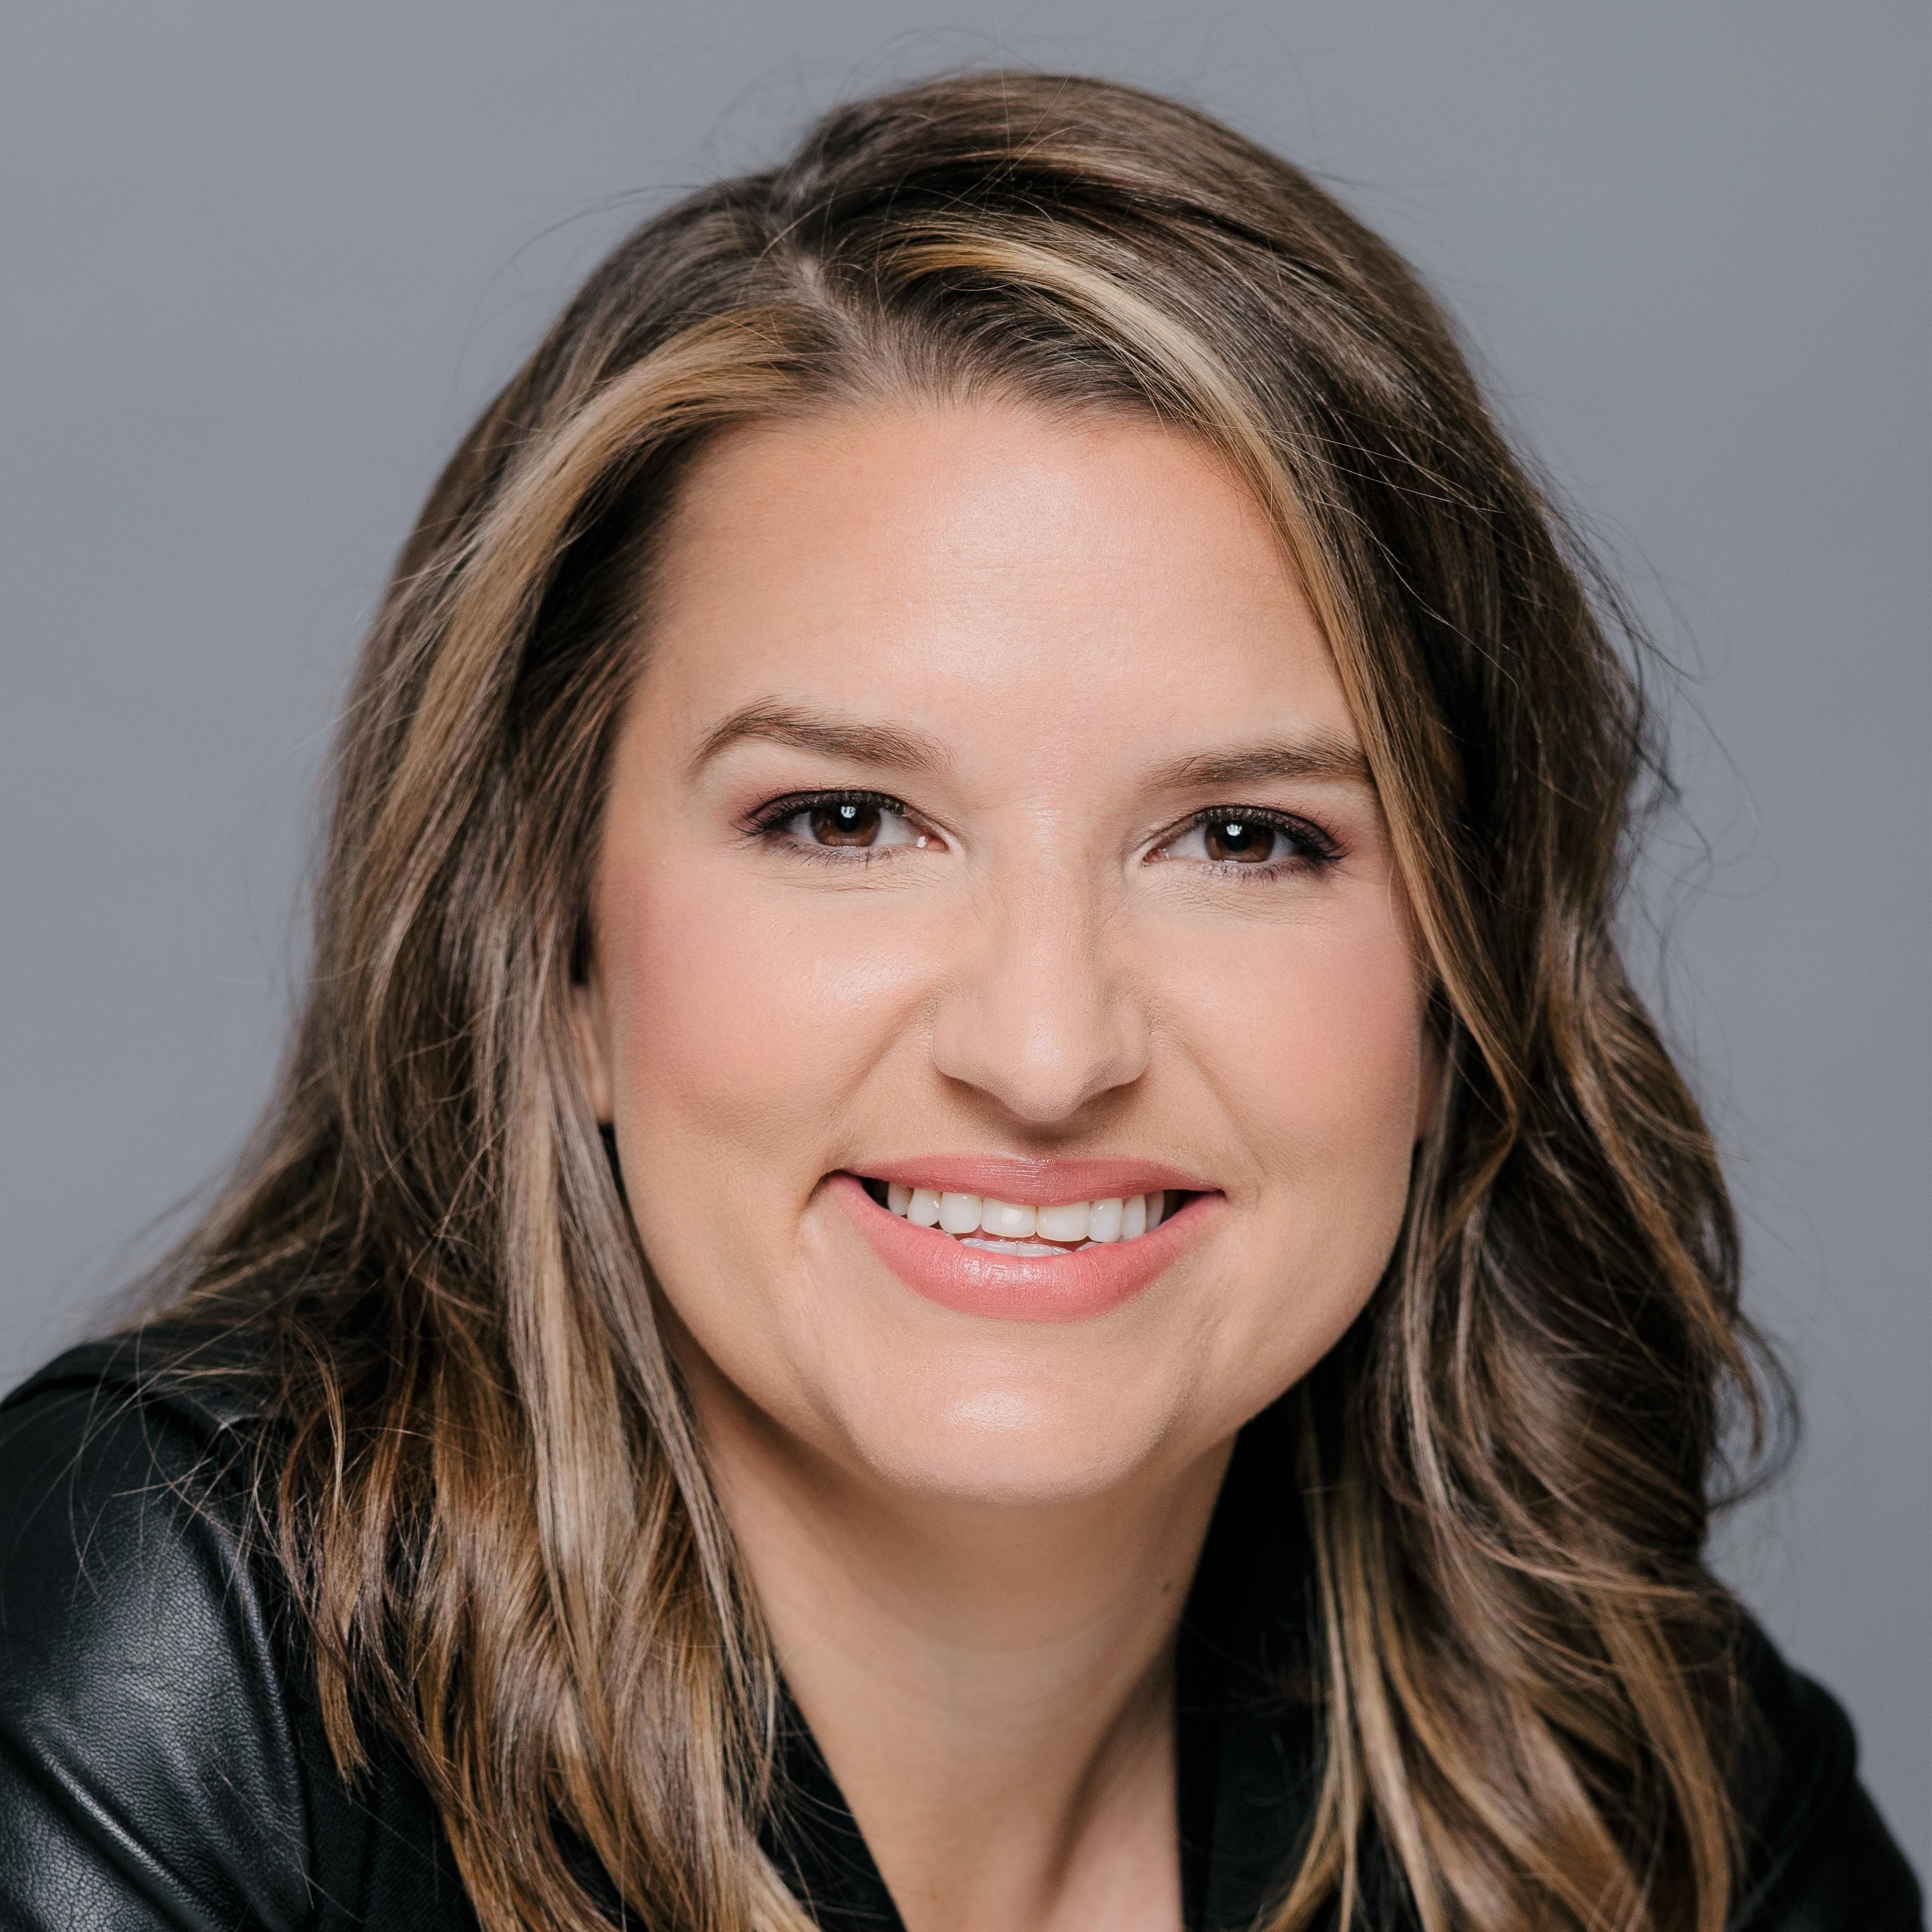 Rachel Romer Carlson